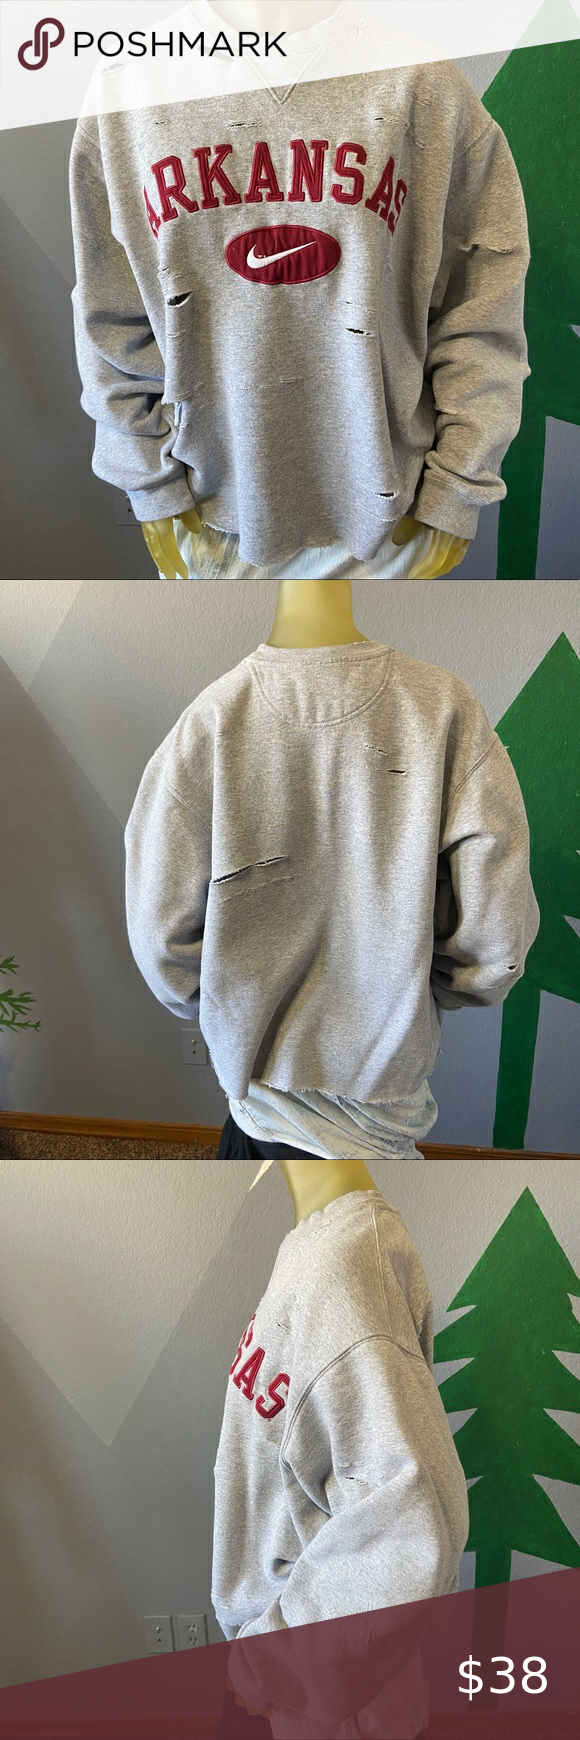 Nike Vintage Arkansas Razorbacks Sweatshirt M In 2021 Vintage Nike Sweatshirt White Nike Sweatshirt Vintage Nike [ 1740 x 580 Pixel ]